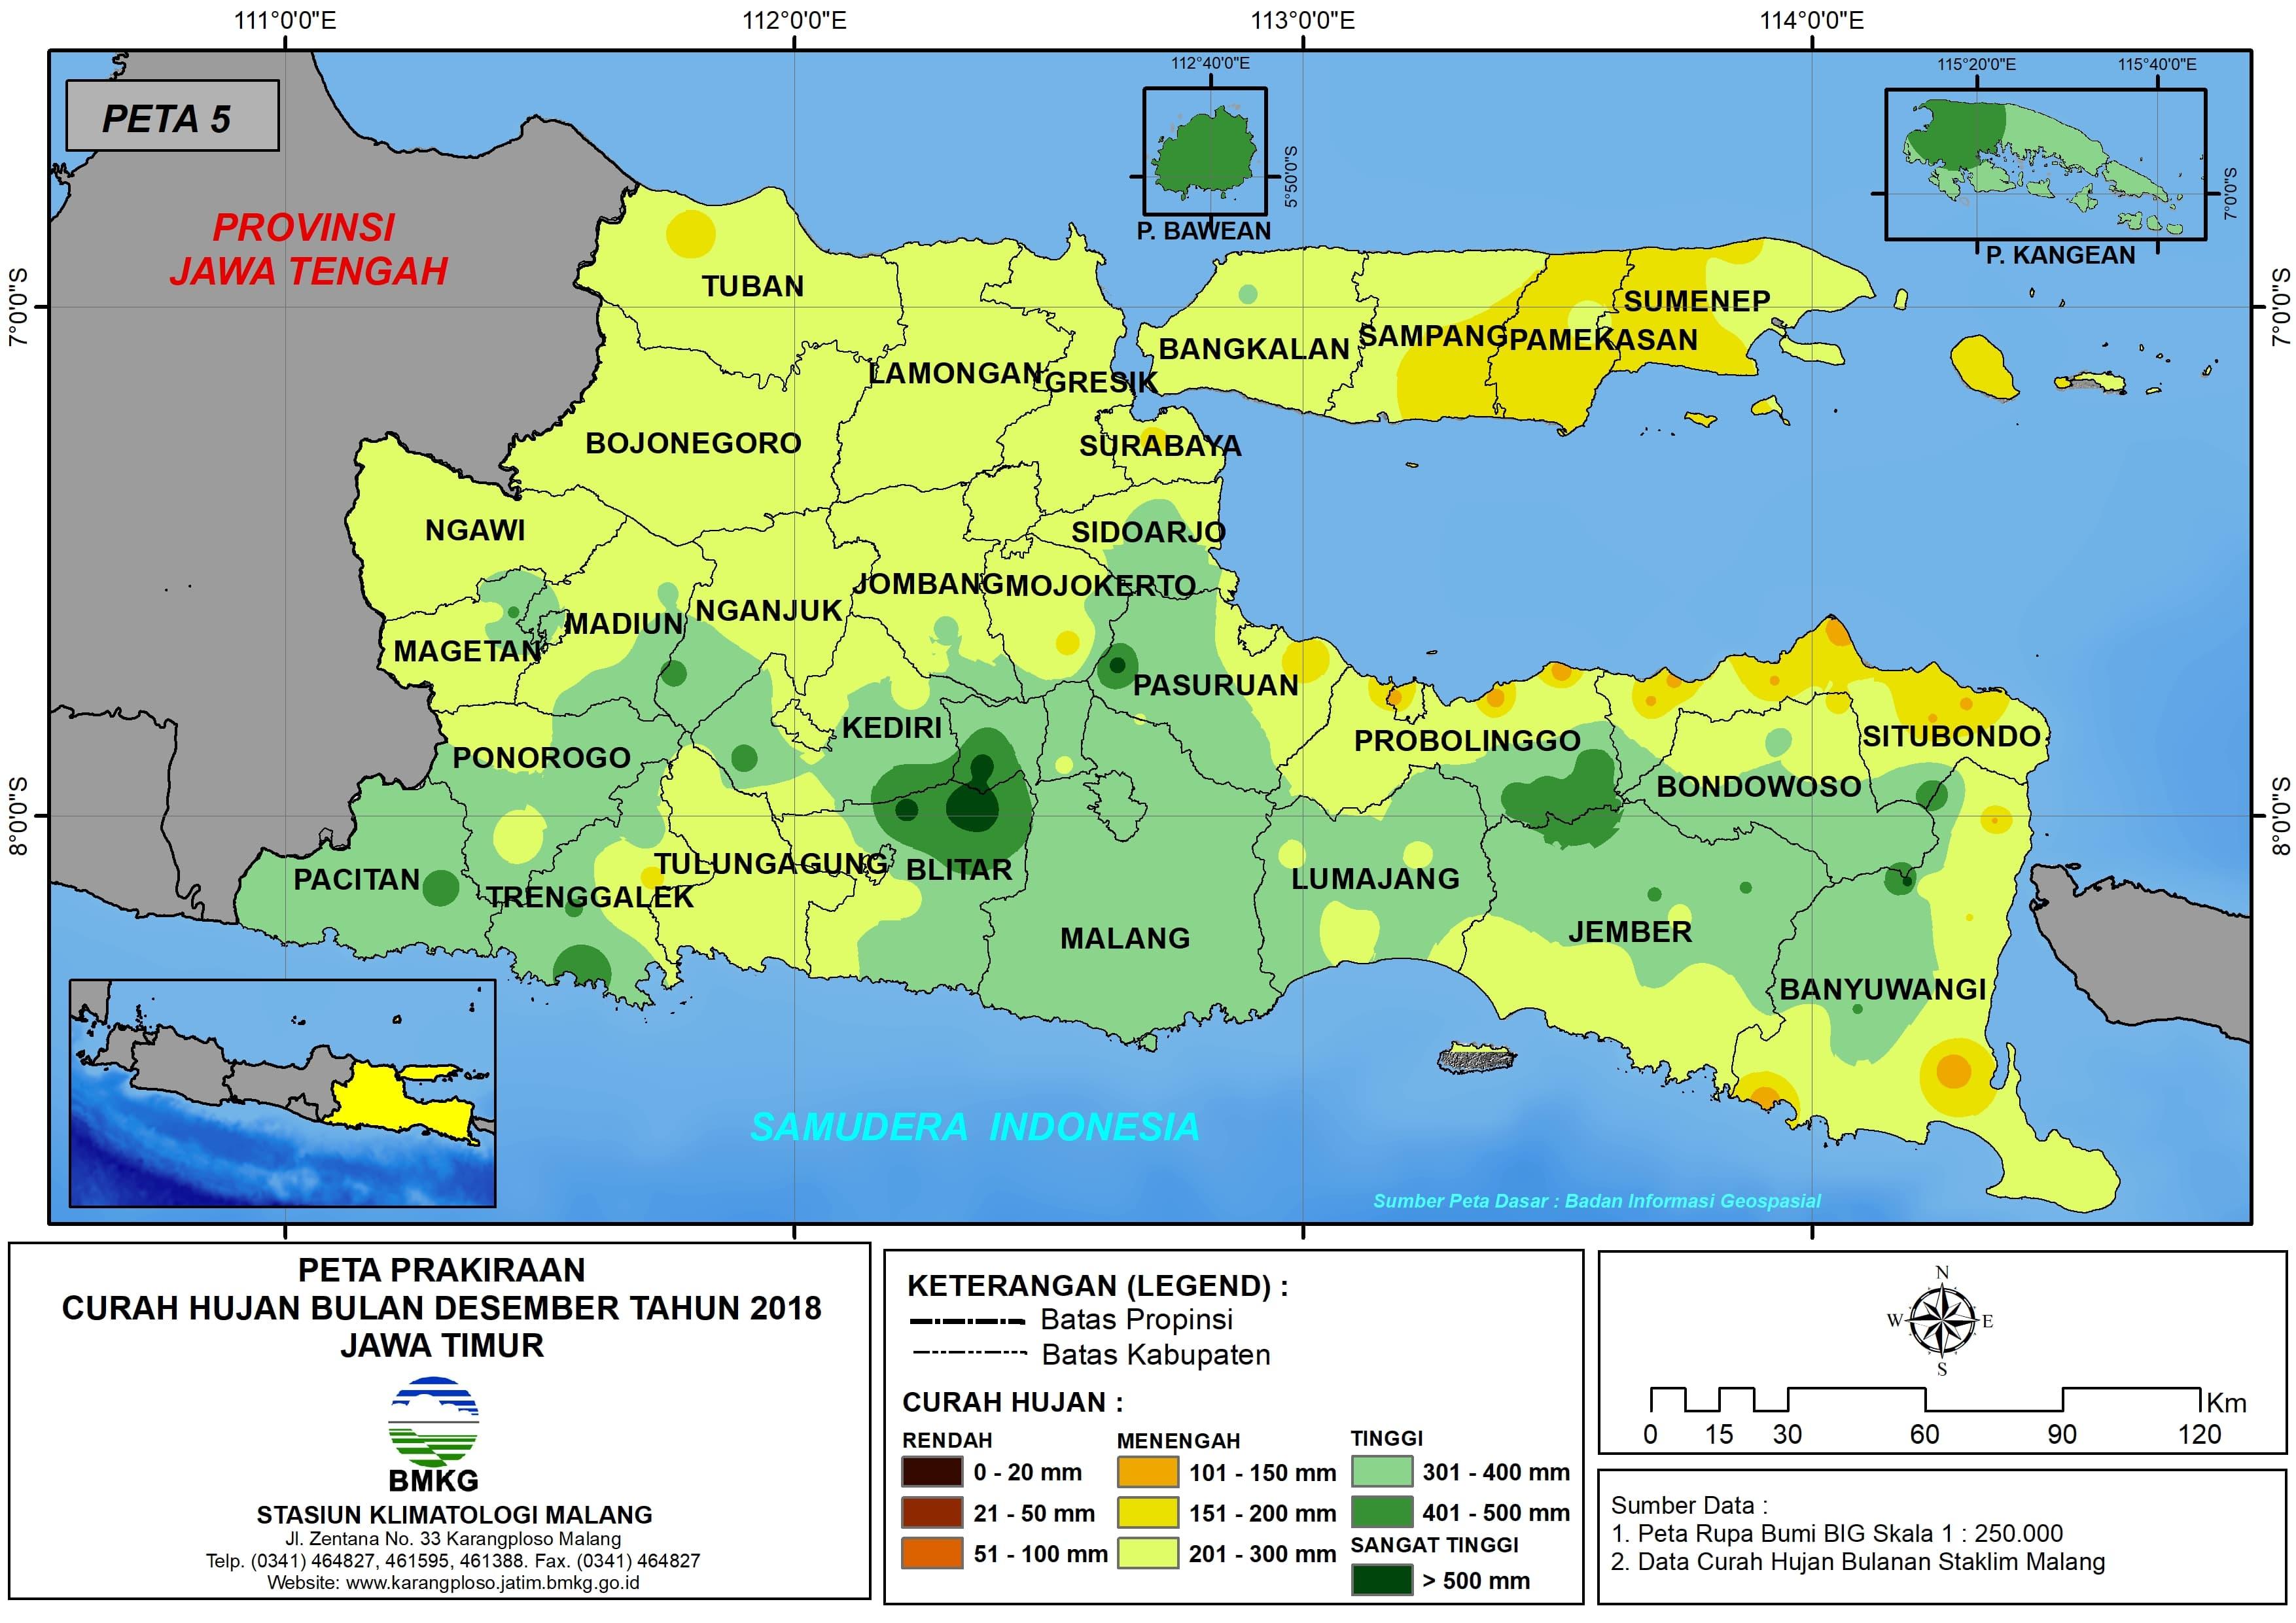 Prakiraan Curah Hujan Bulan Desember Tahun 2018 di Provinsi Jawa Timur Update dari Analisis Bulan Oktober 2018